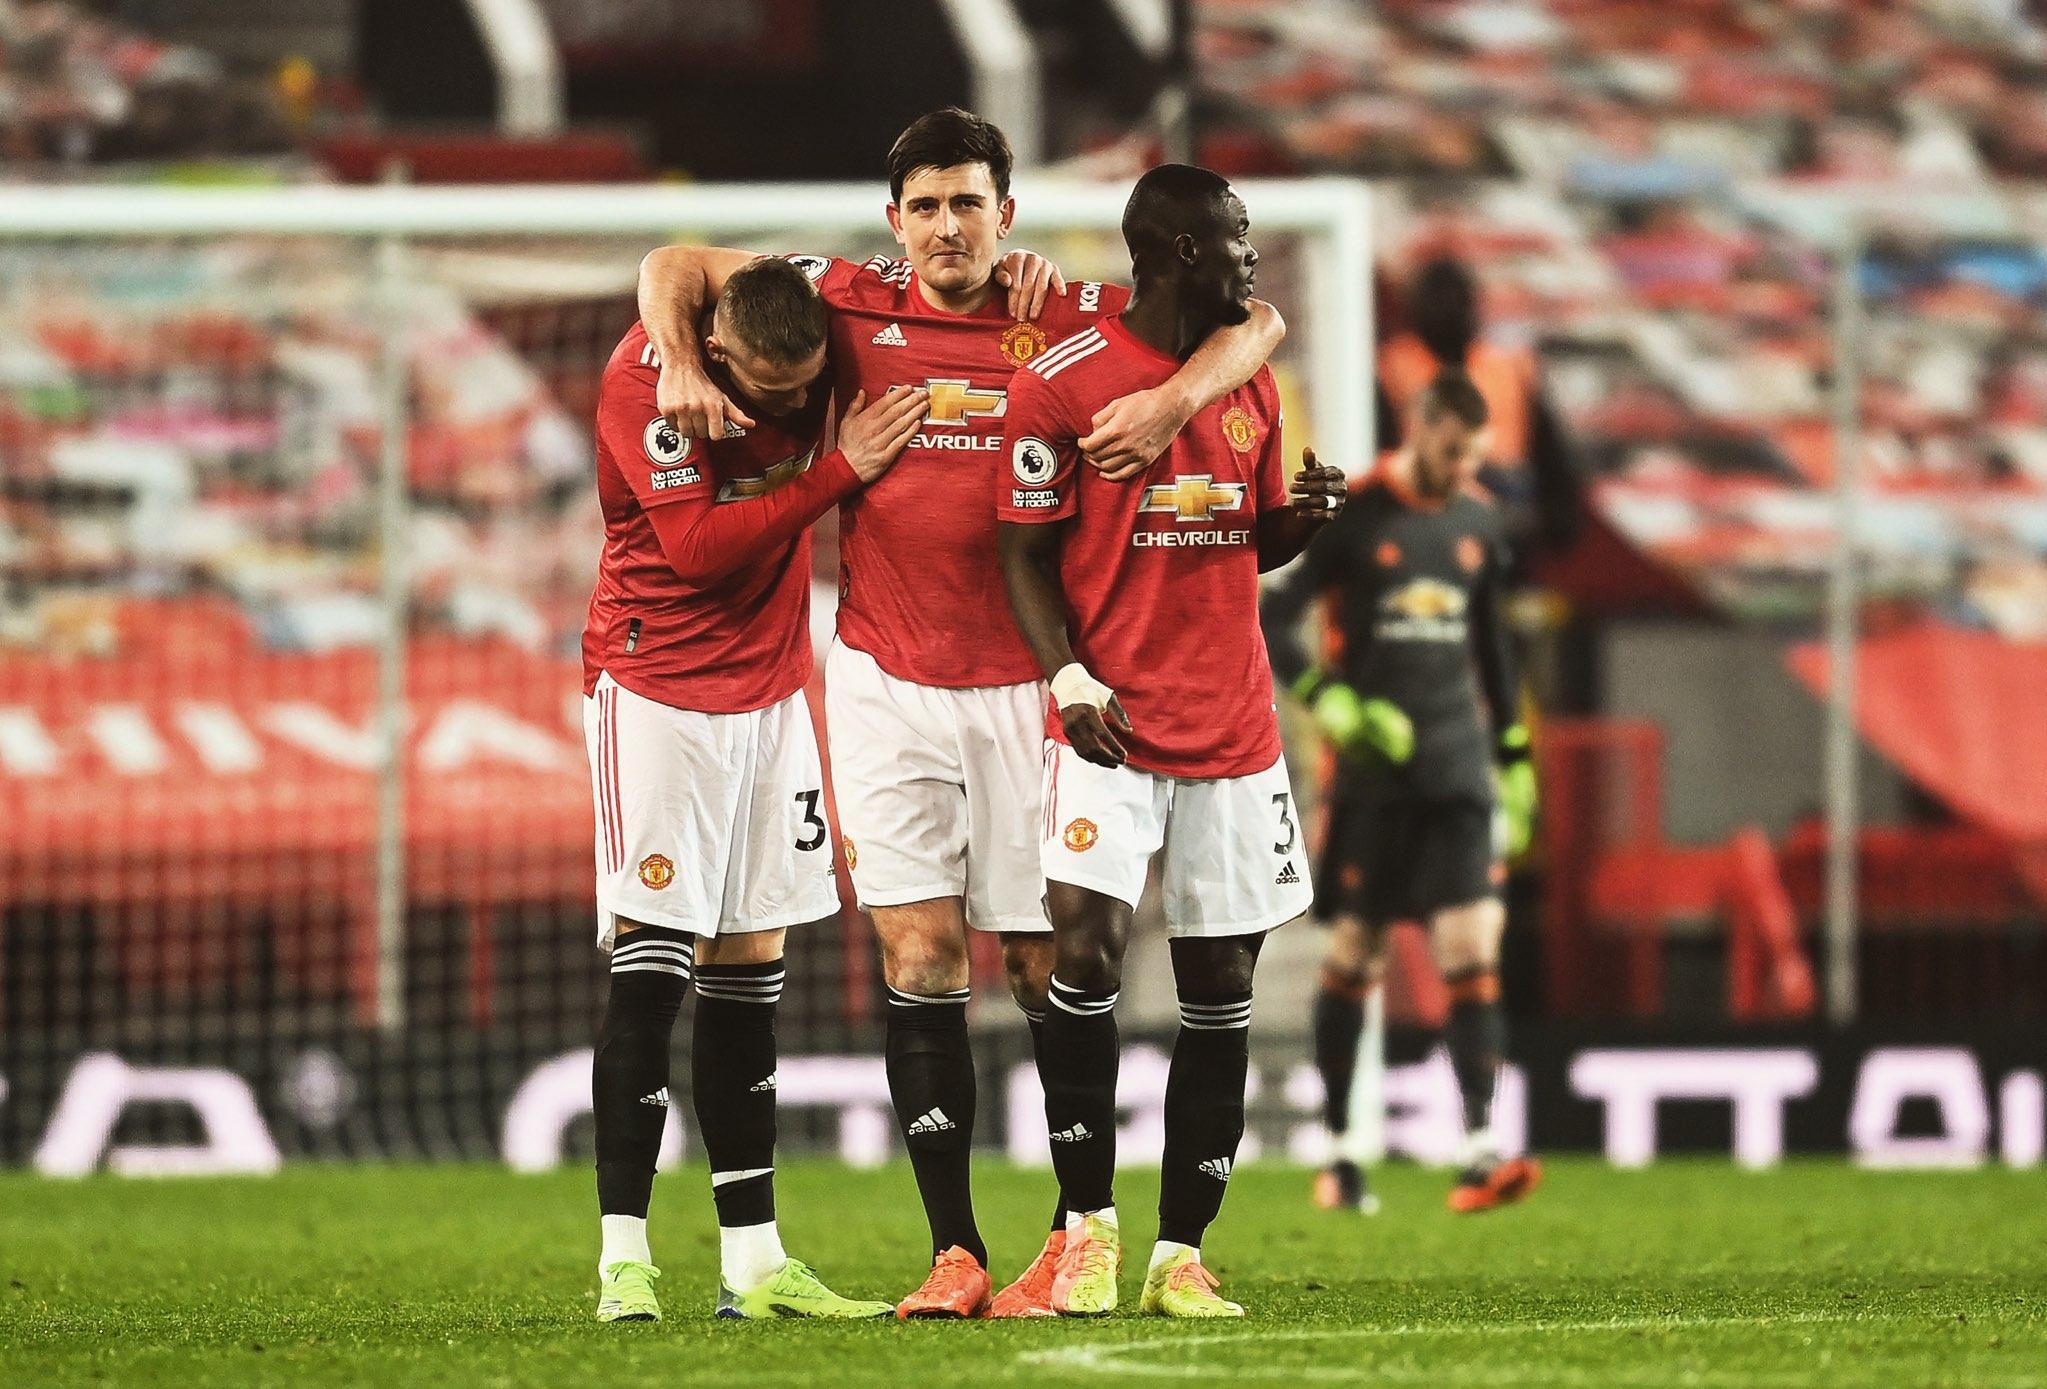 Manchester United x Aston Villa